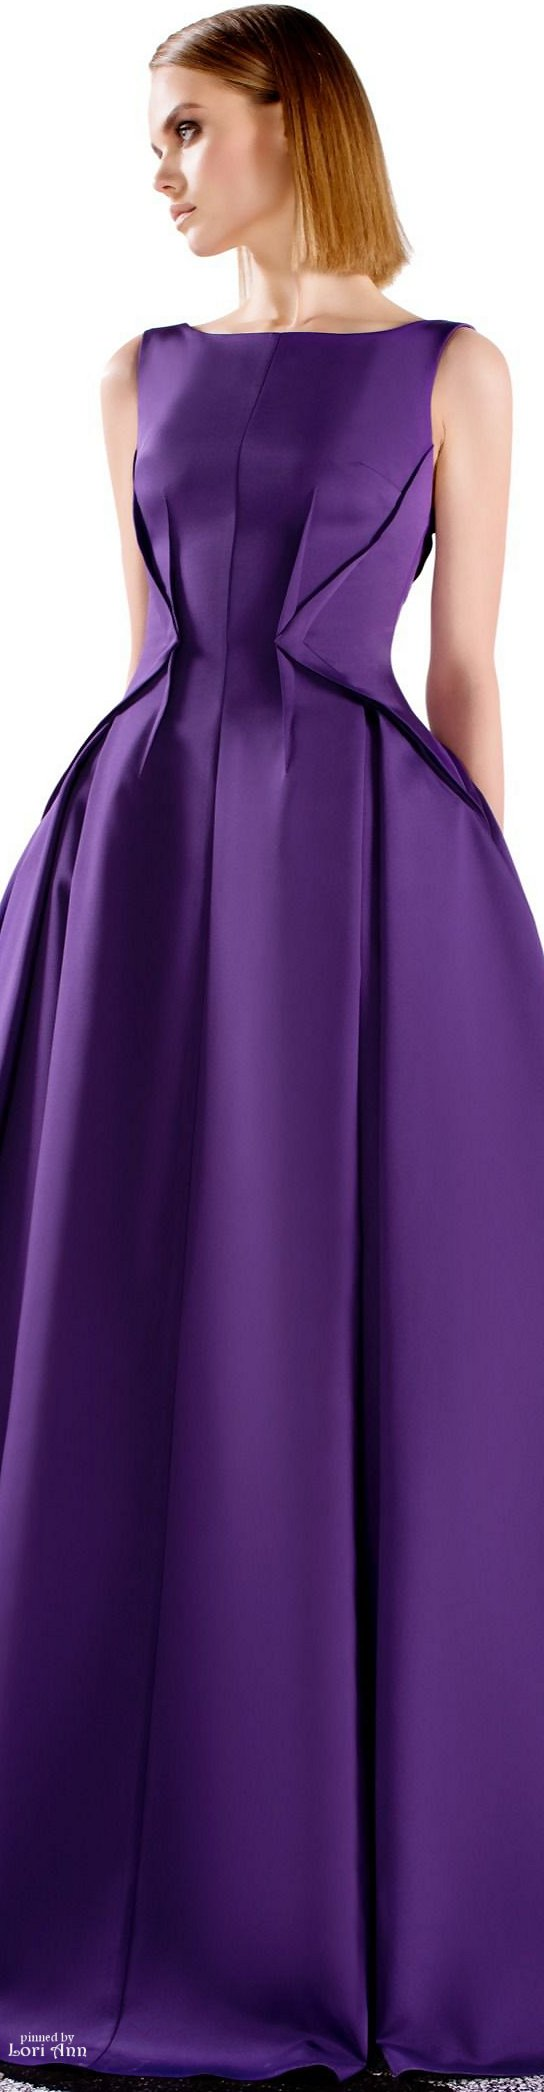 happyskirtt.com #purple | Divinidades! | Pinterest | Lilas, Púrpura ...